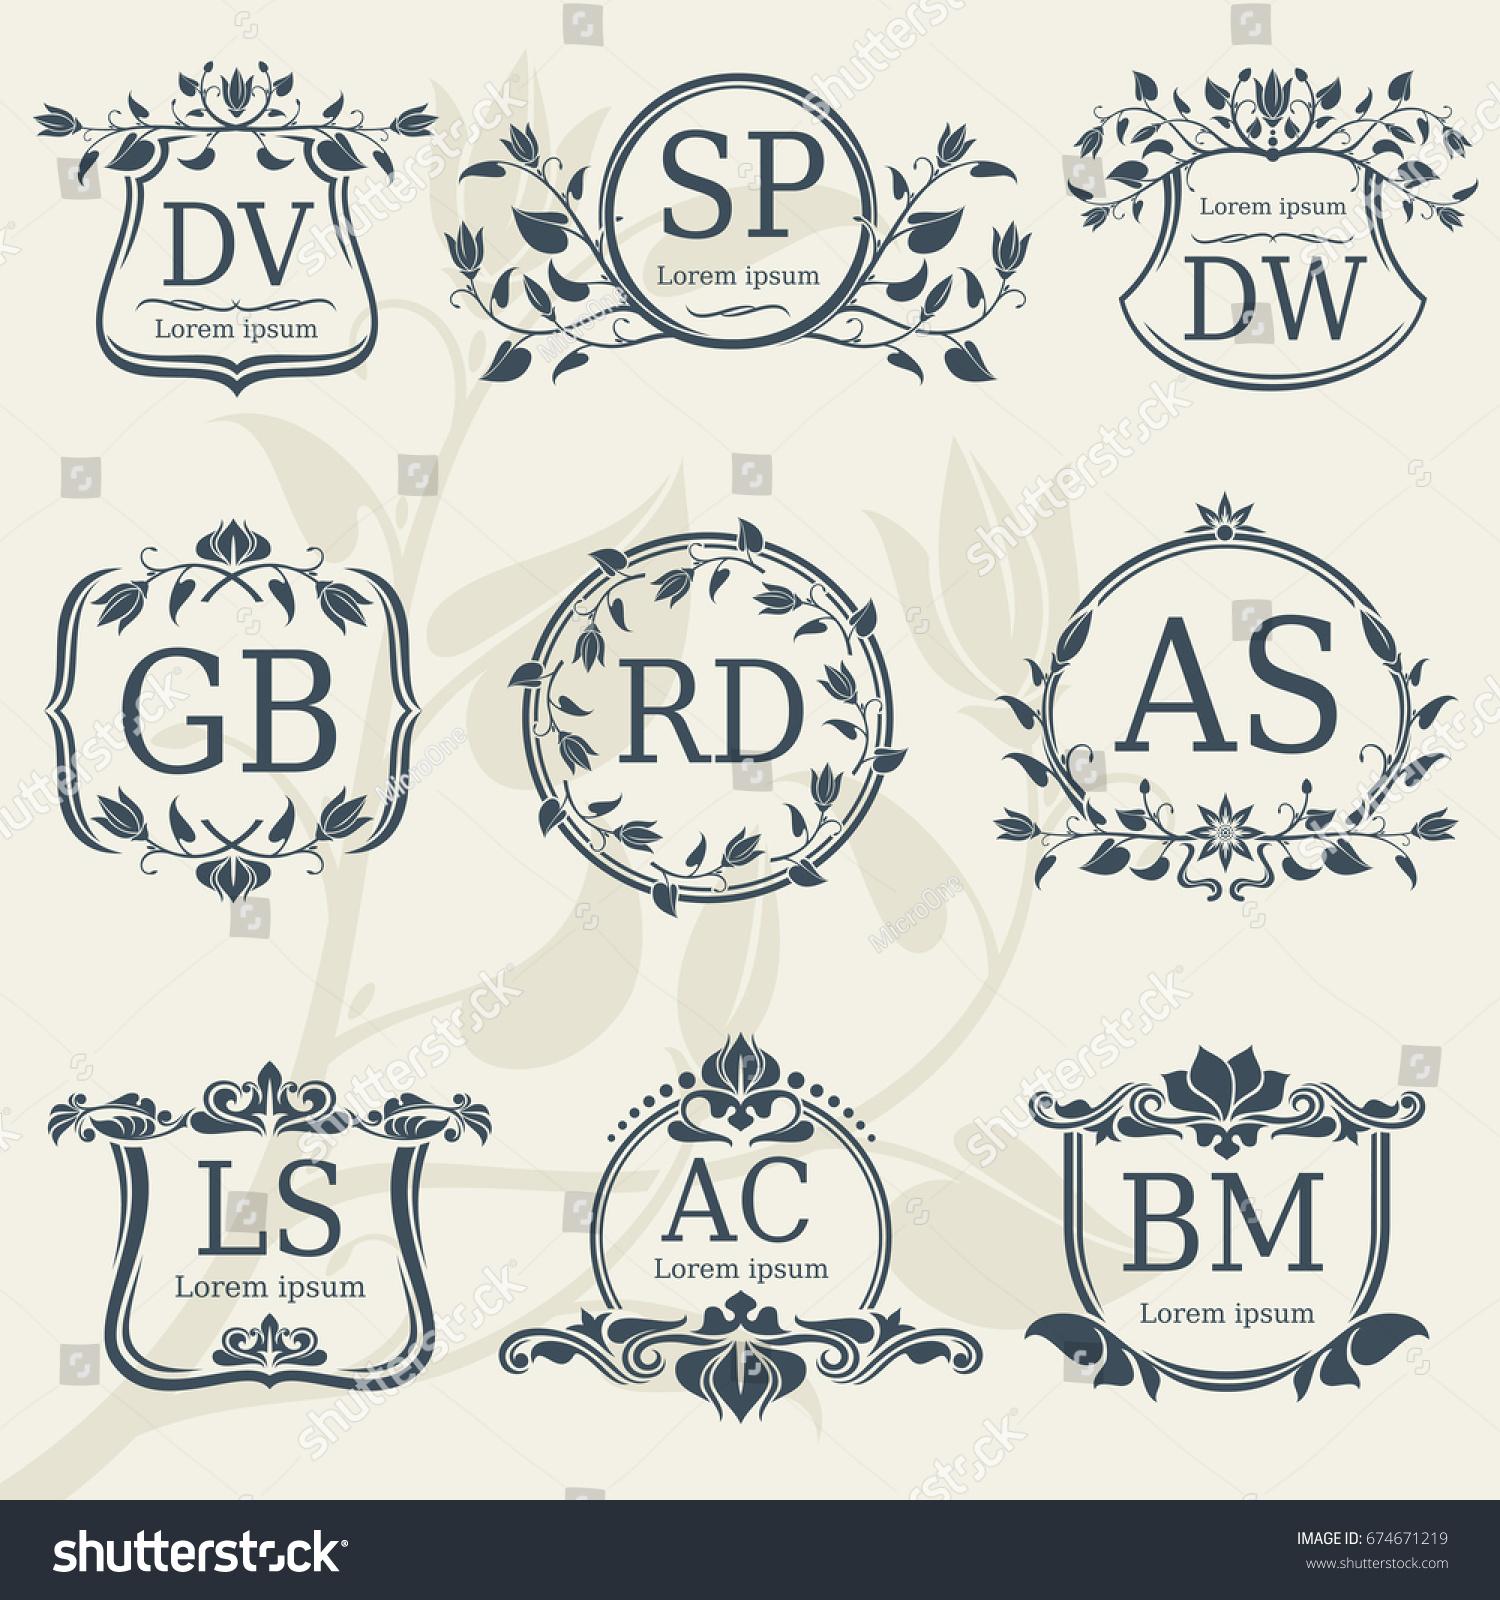 Vintage Elegance Wedding Monograms Floral Frames Stock Vector Royalty Free 674671219